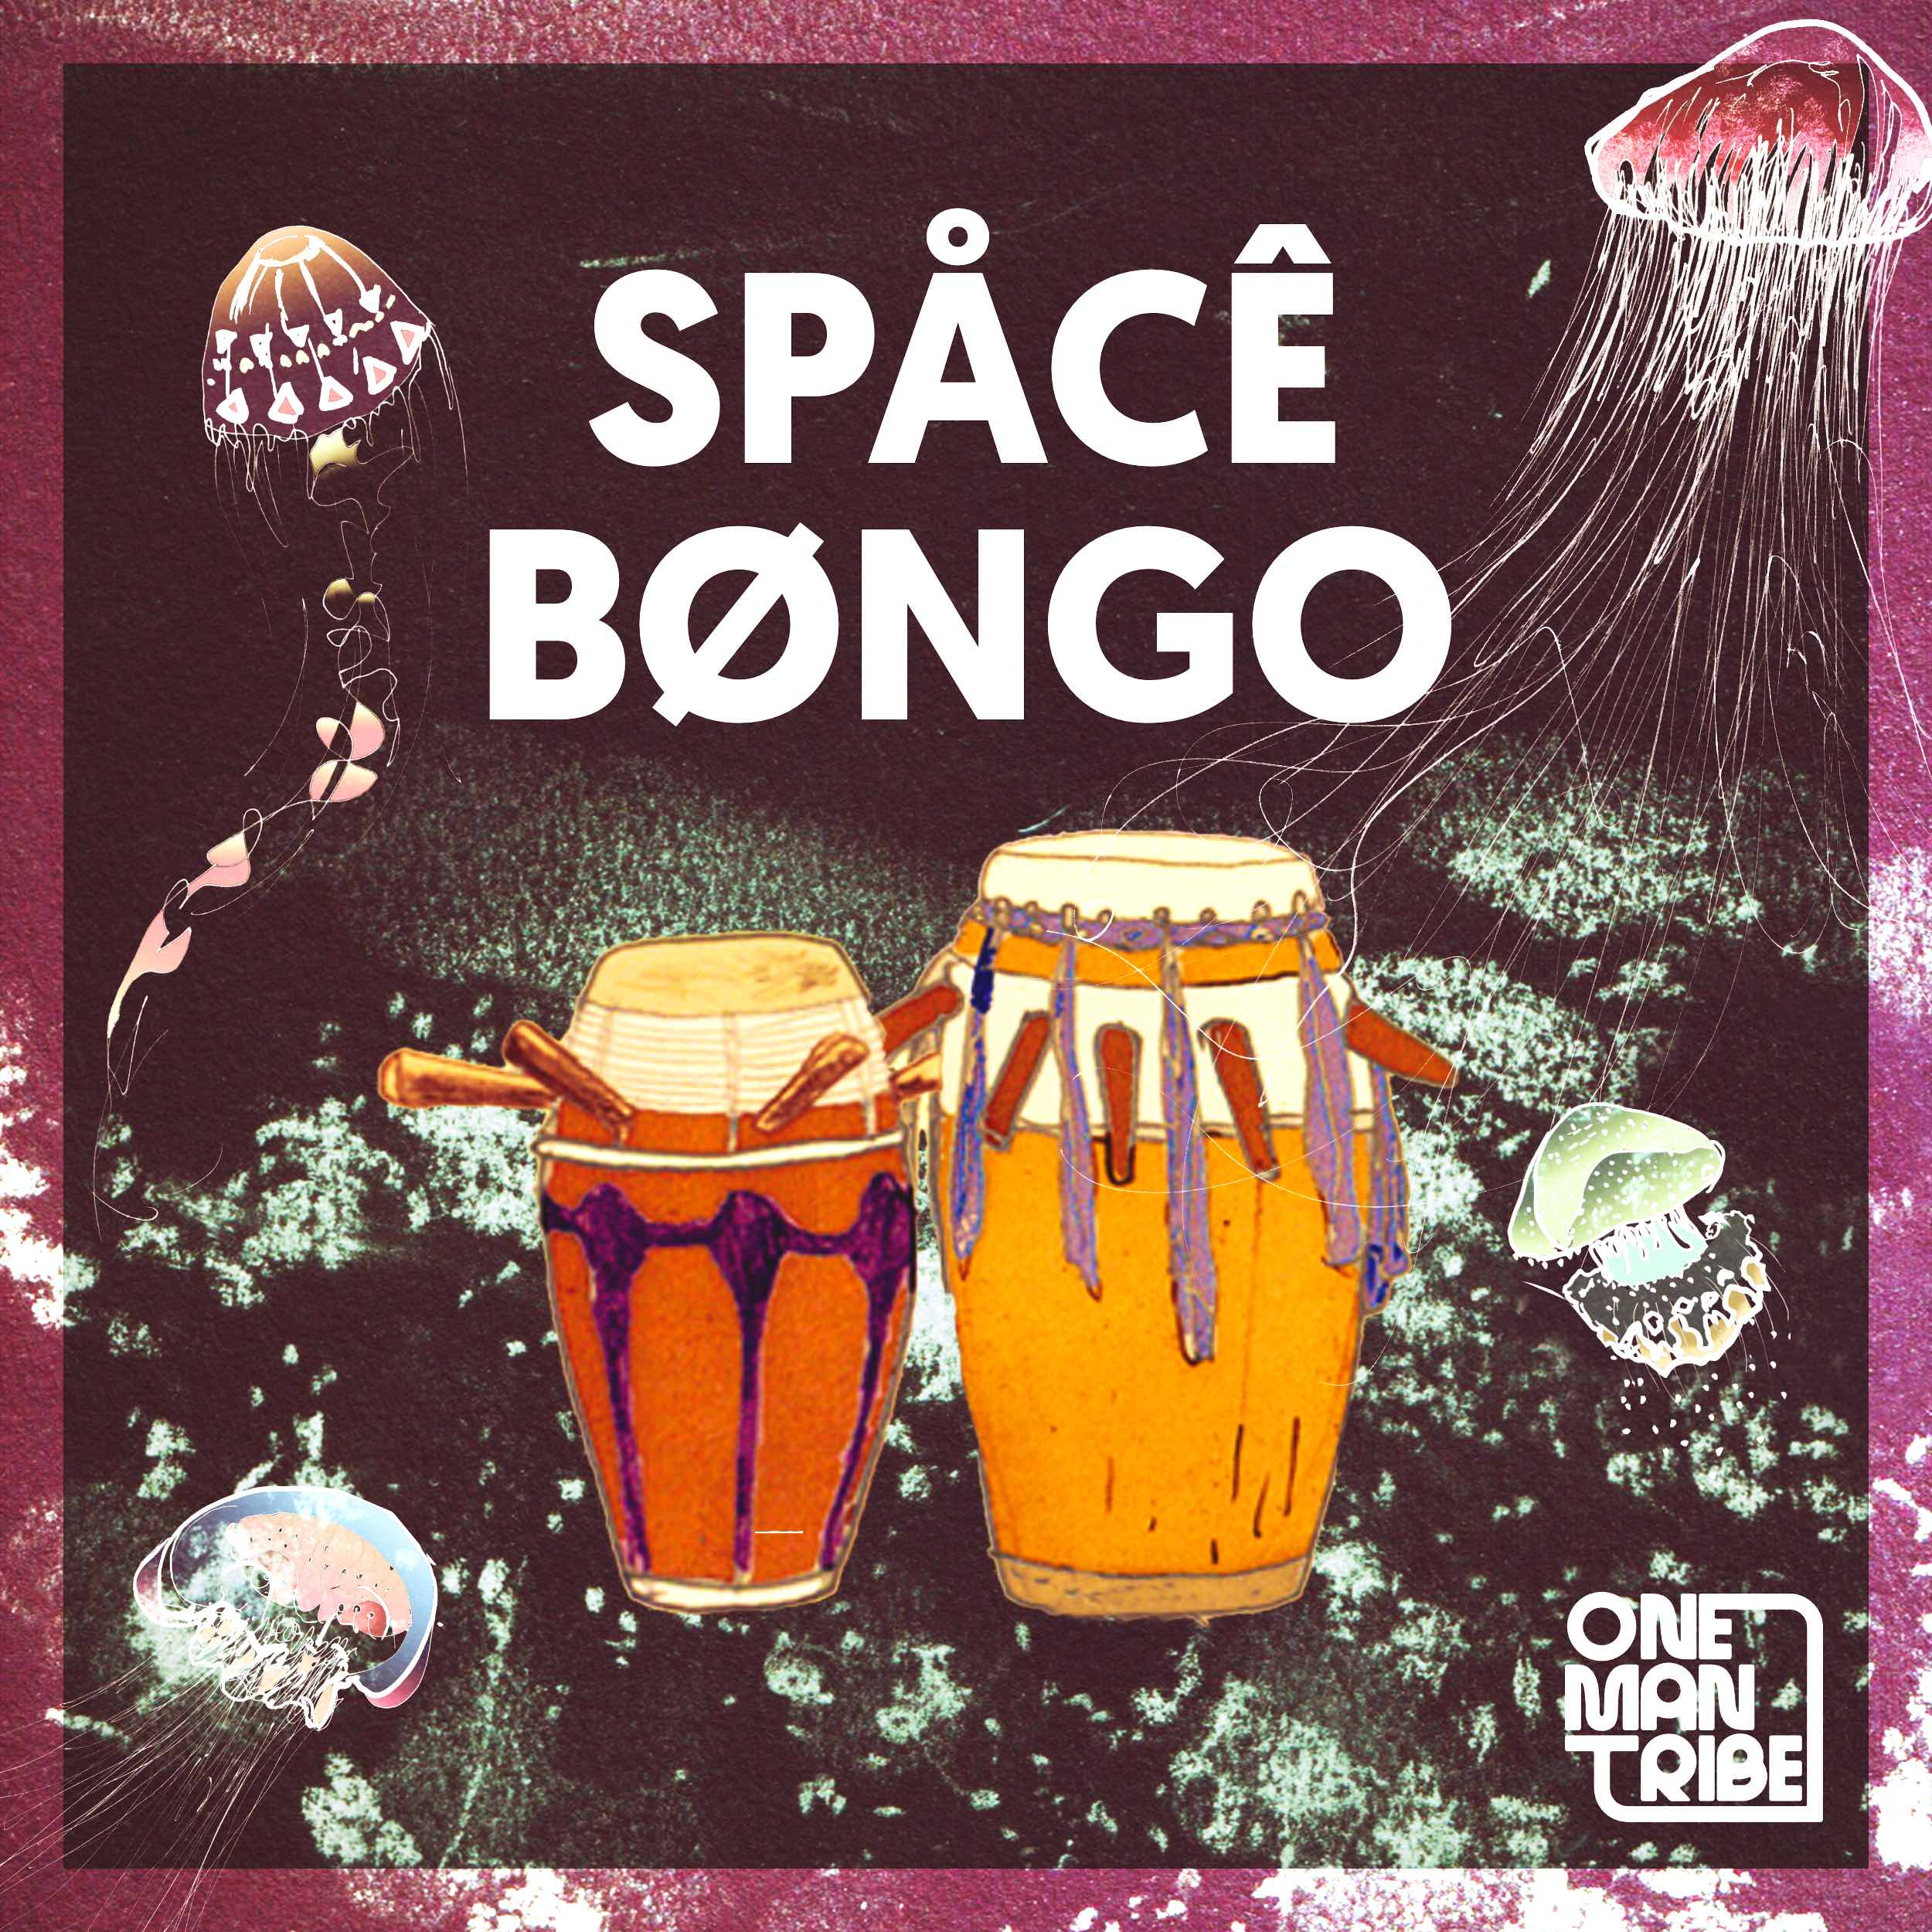 Space Bongo